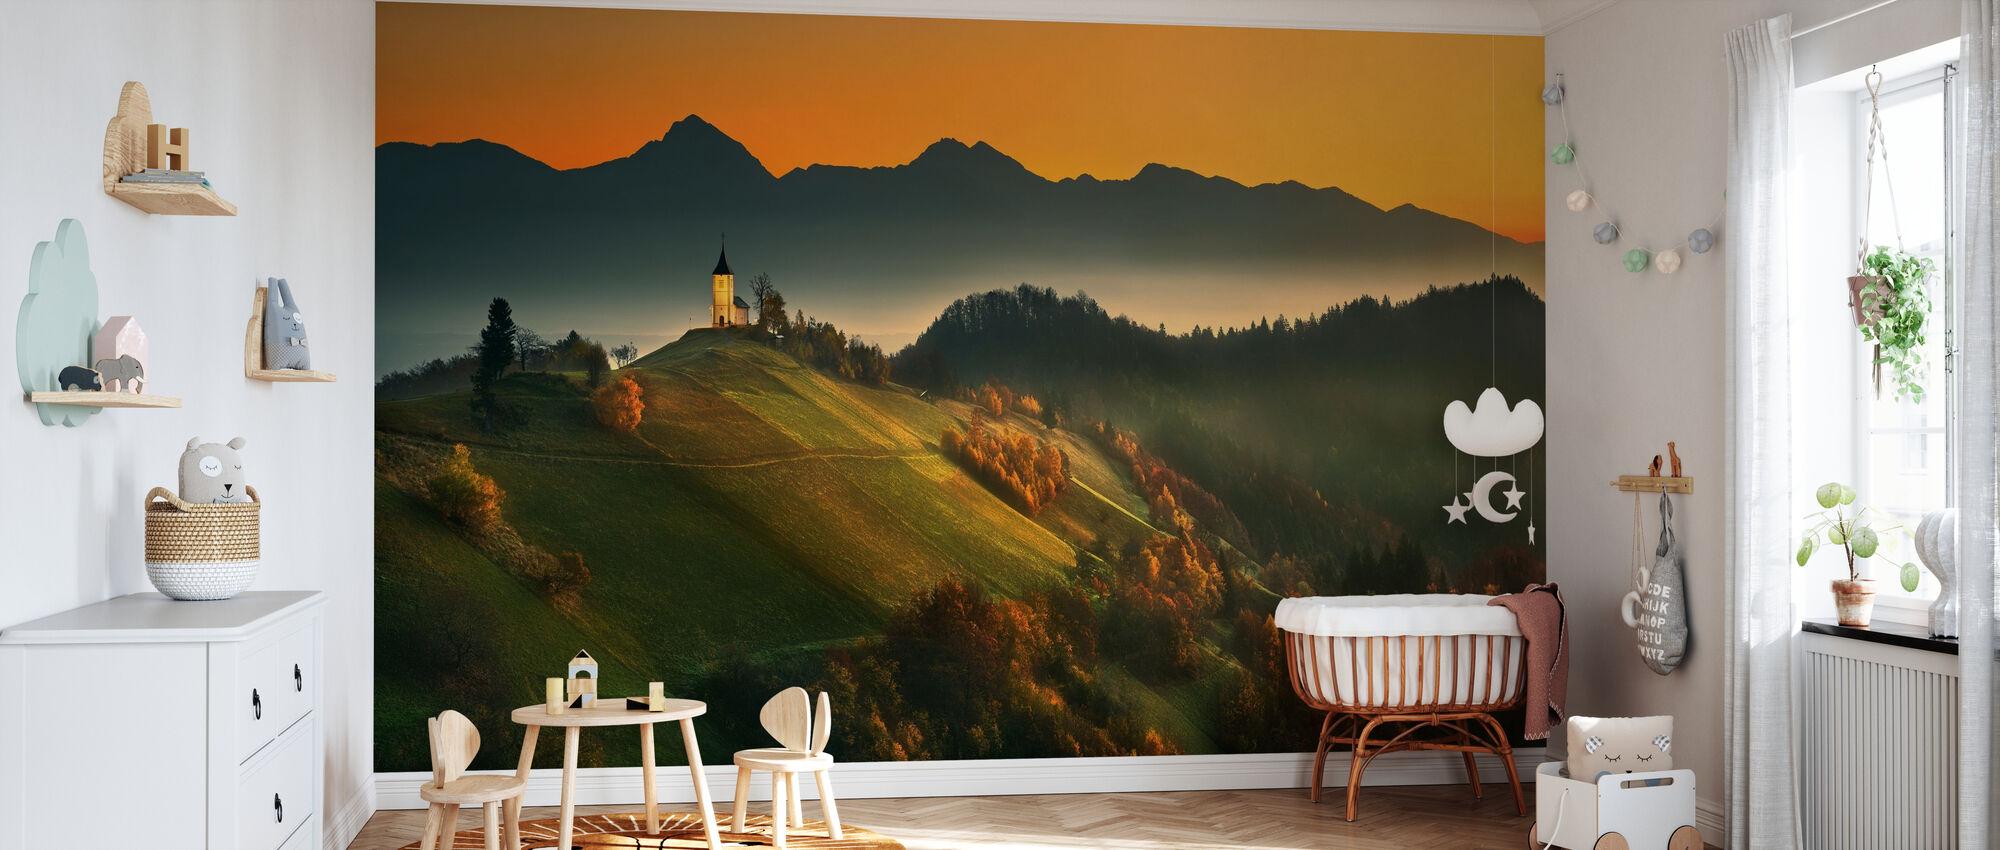 Sloveense herfst - Behang - Babykamer